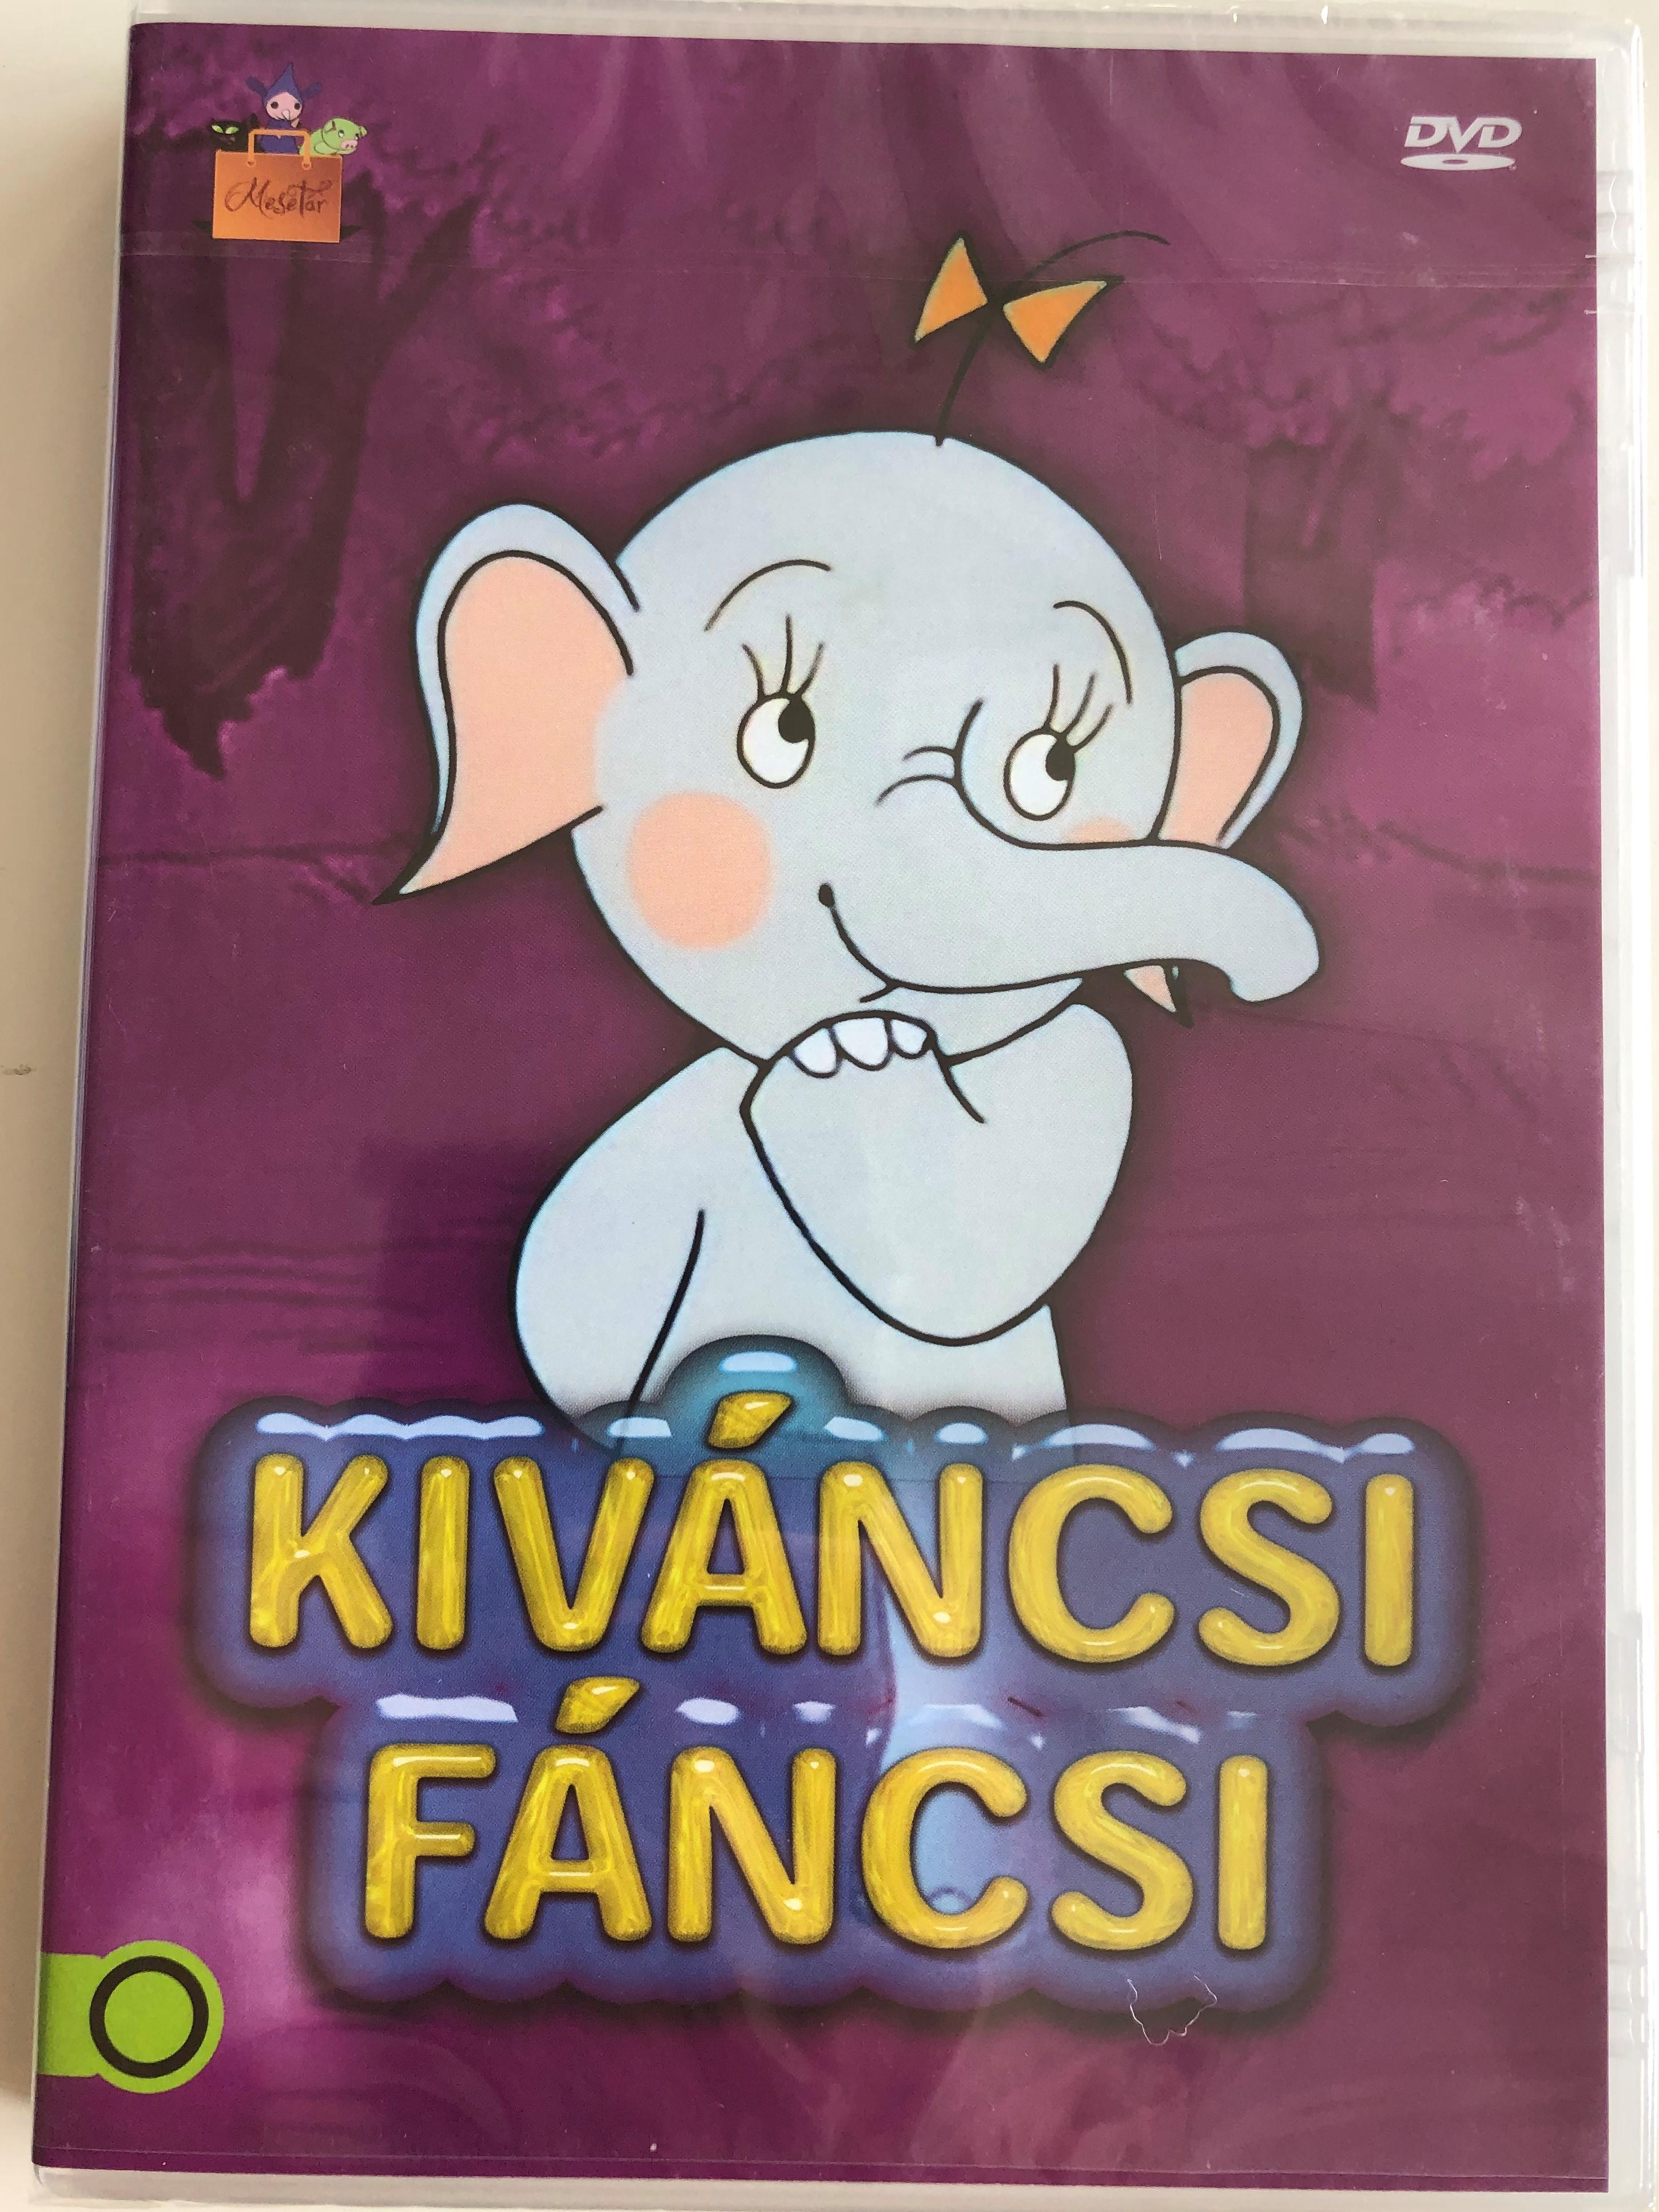 k-v-ncsi-f-ncsi-1989-dvd-hungarian-cartoon-series-directed-by-richly-zsolt-1.jpg